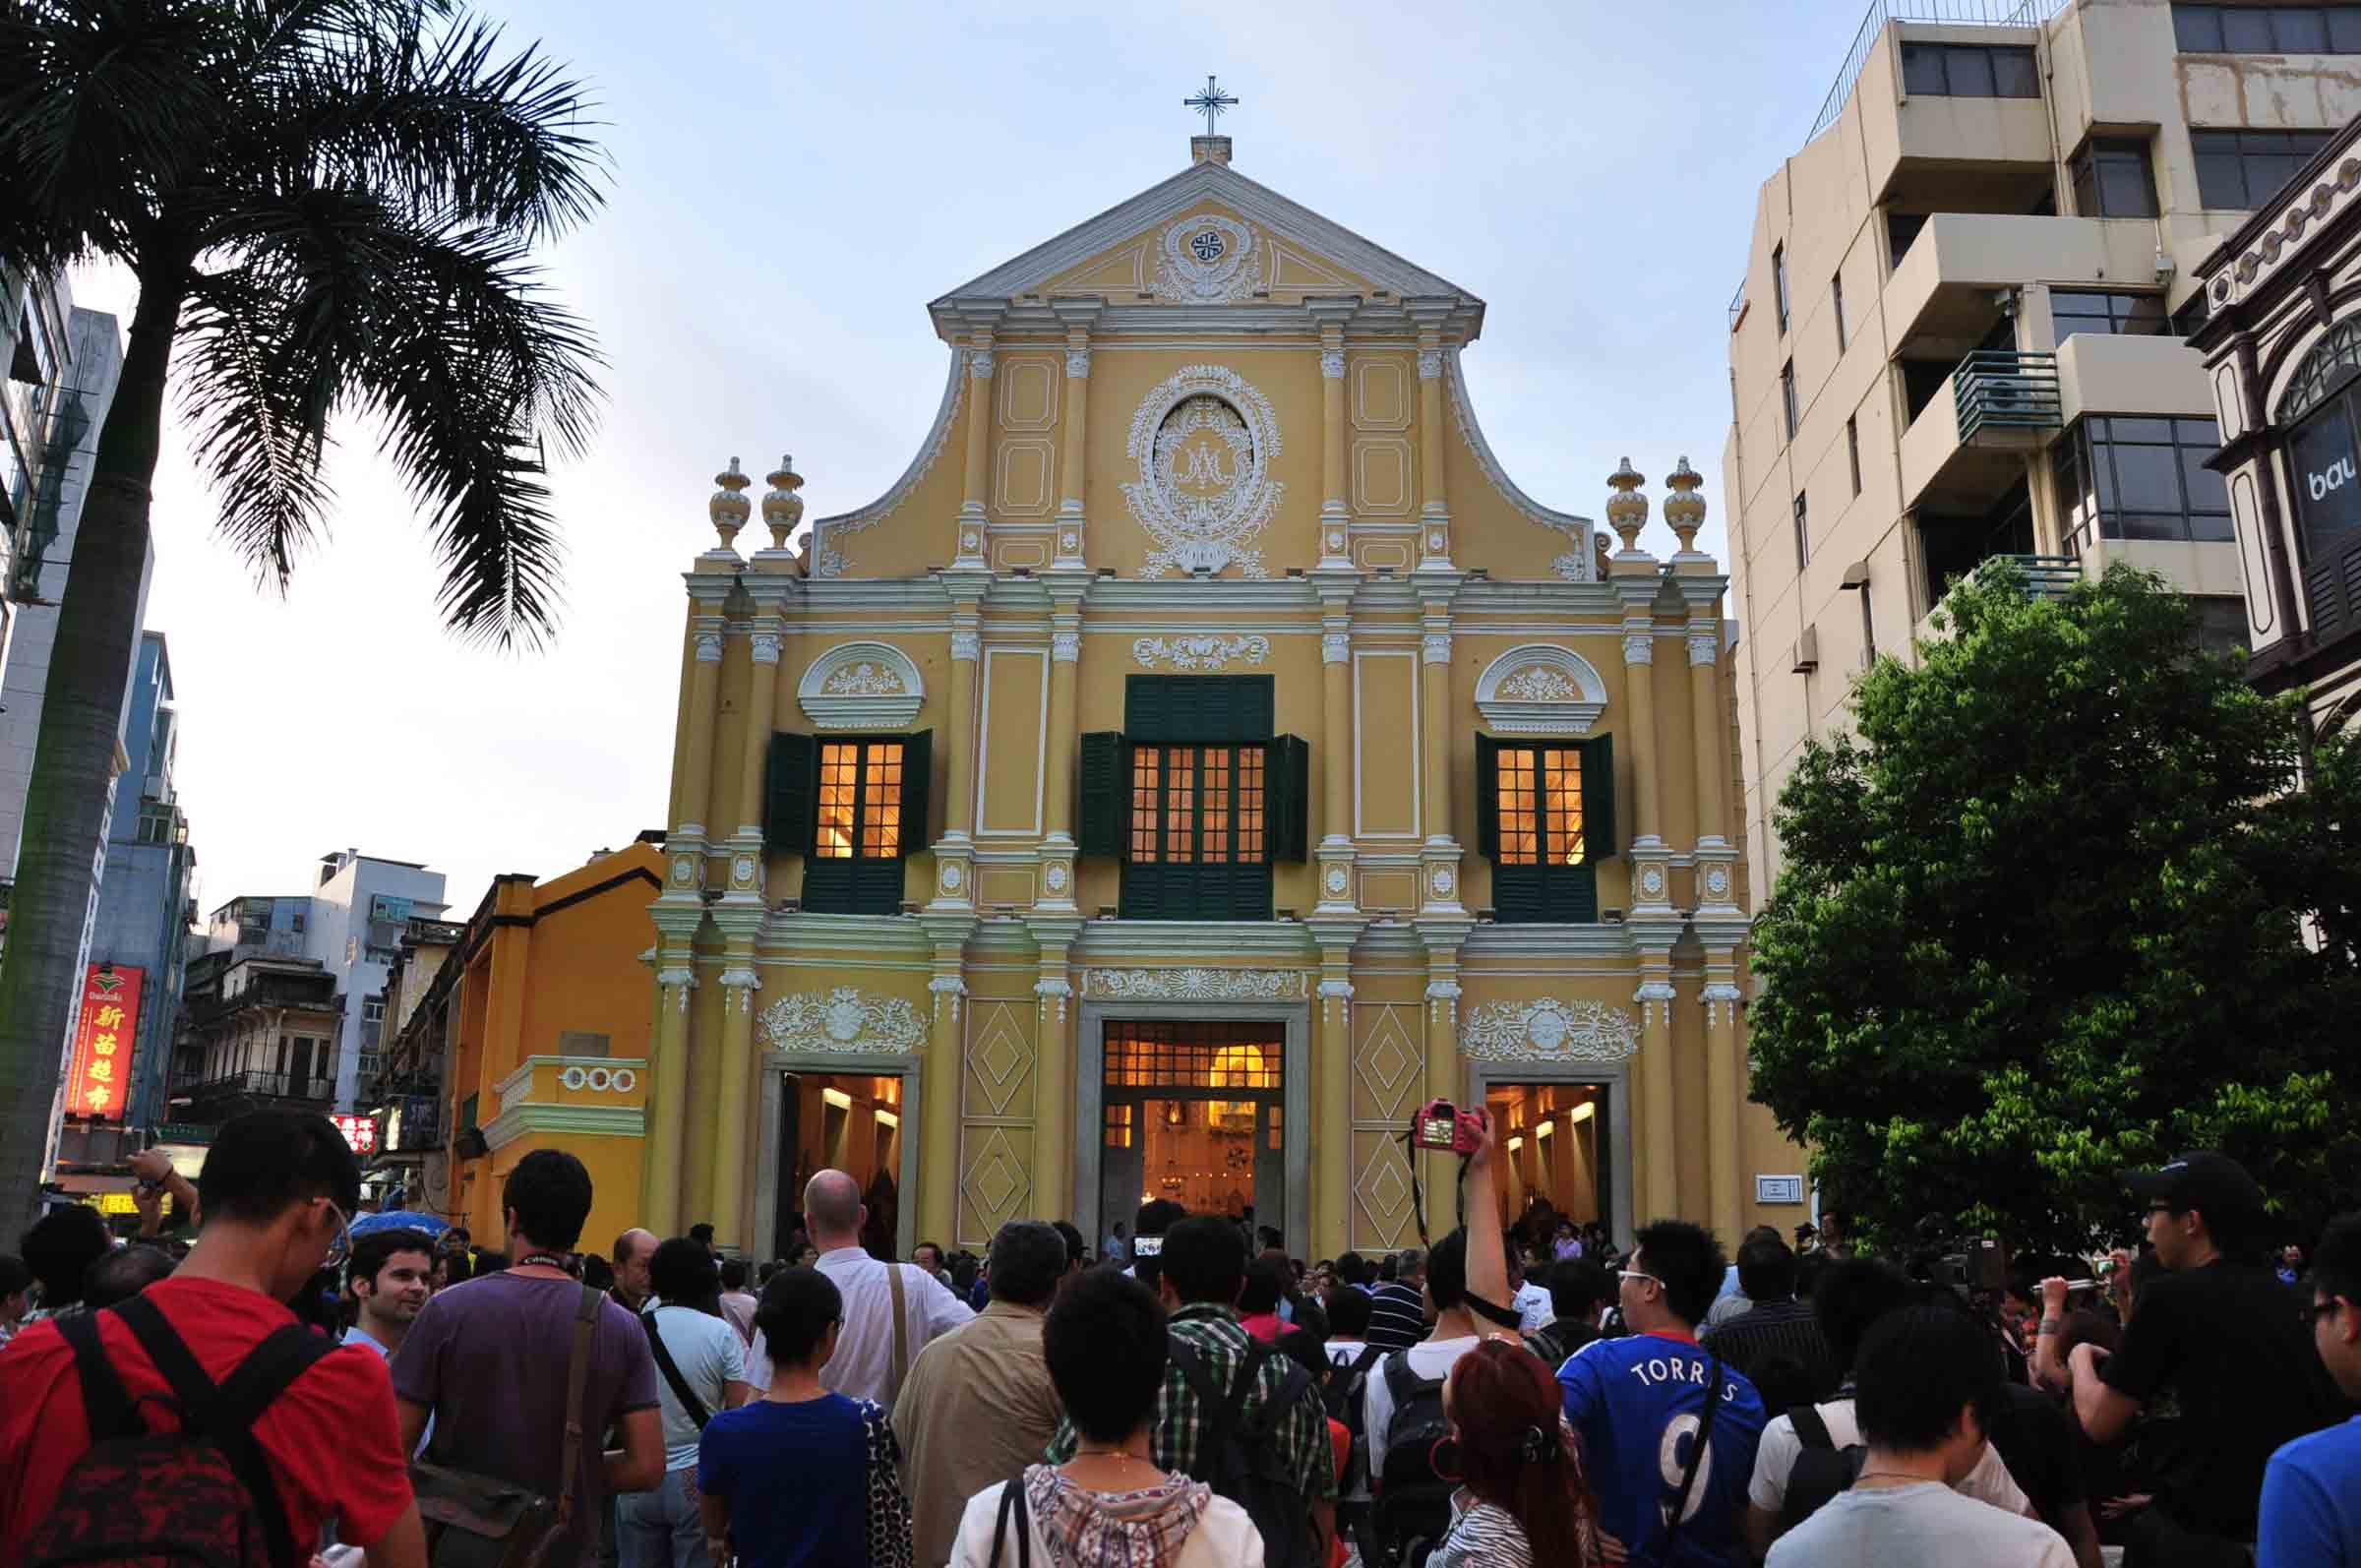 Macau's Our Lady of Fatima Procession St Dominics Church